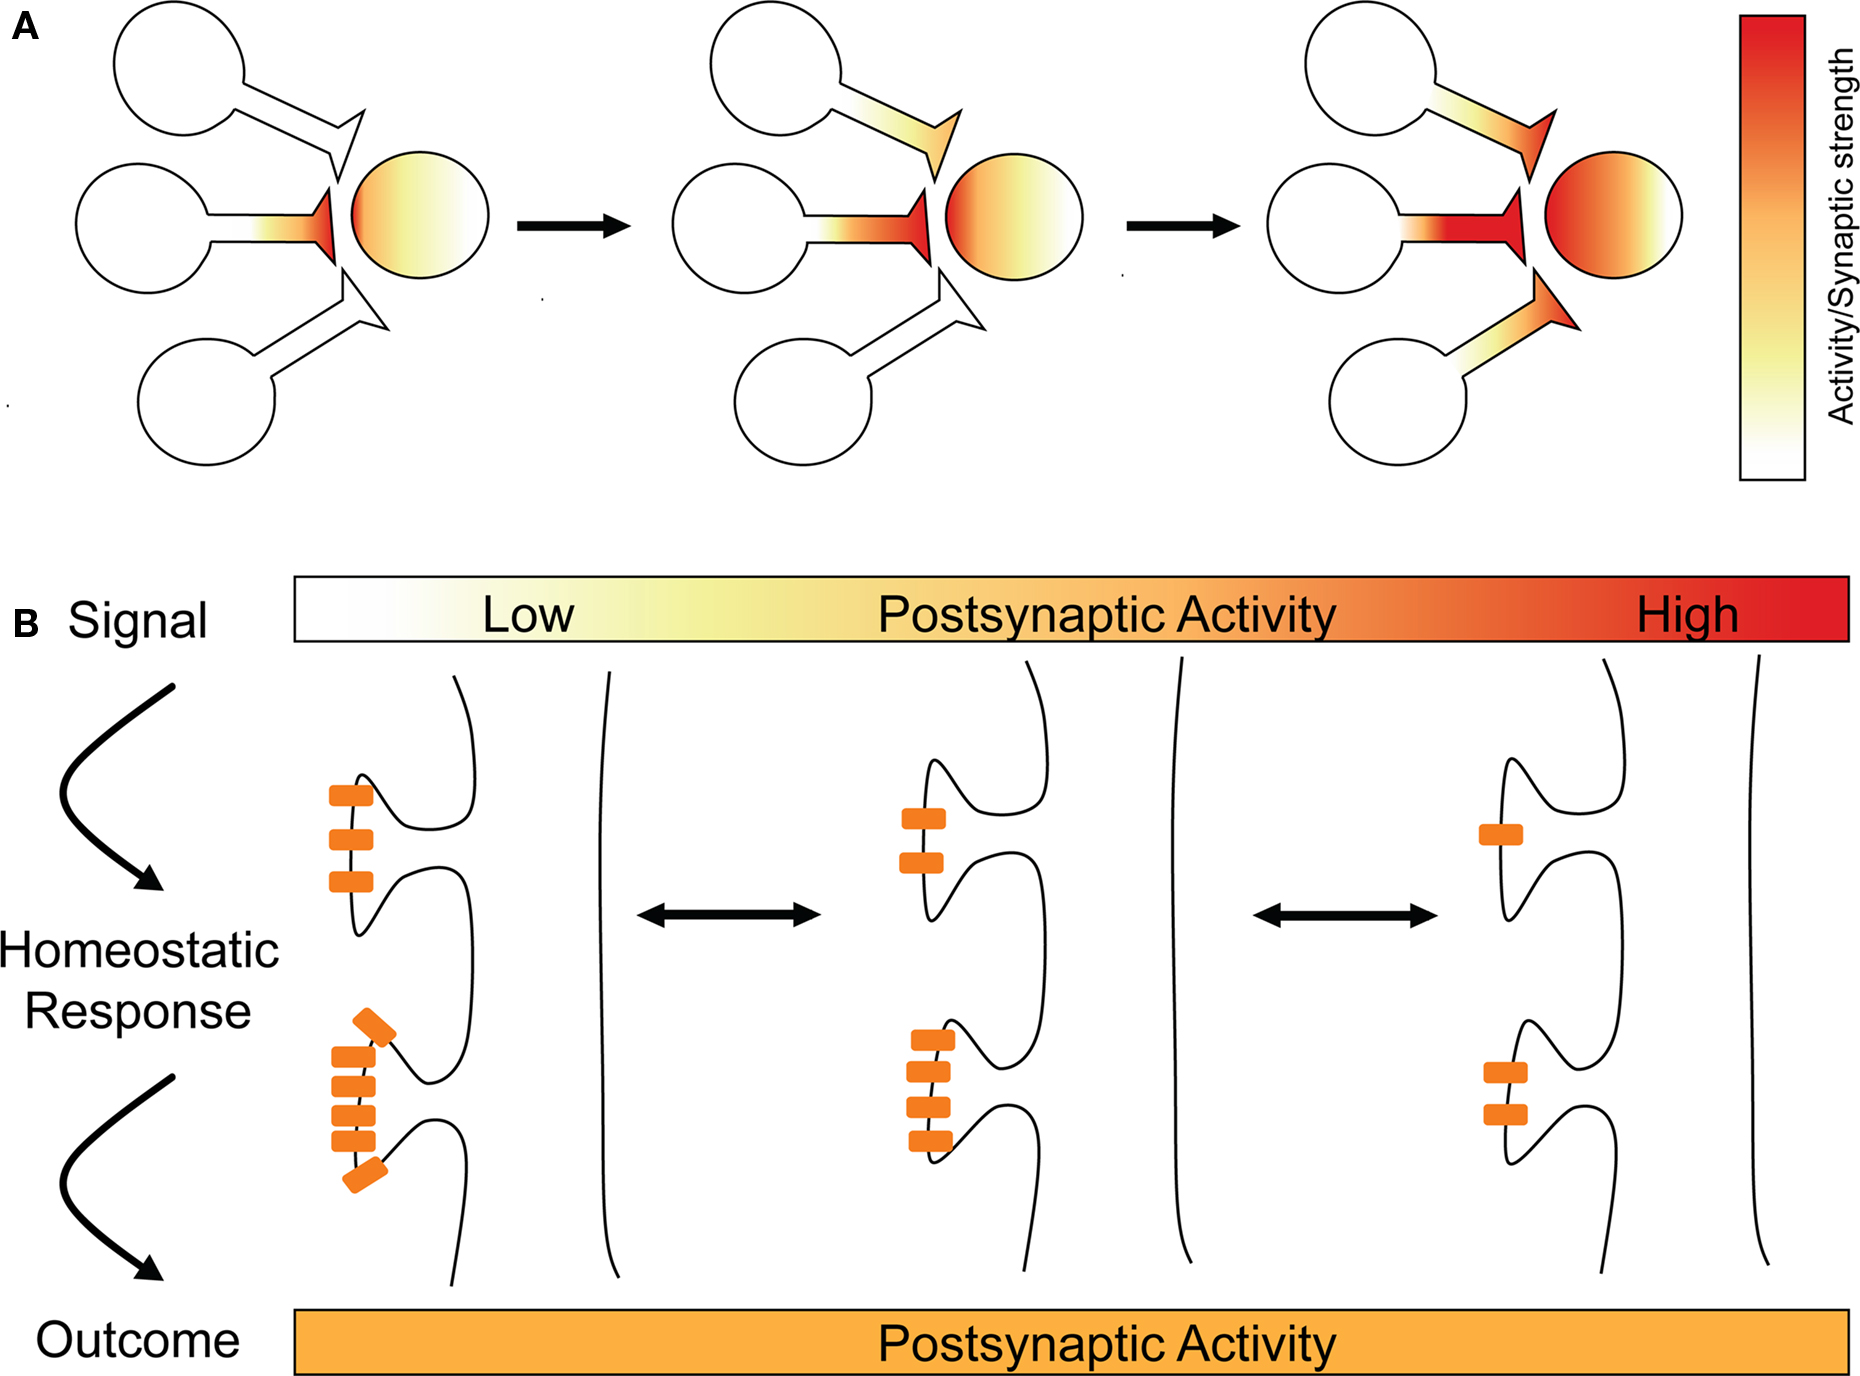 Homesotatic plasticity